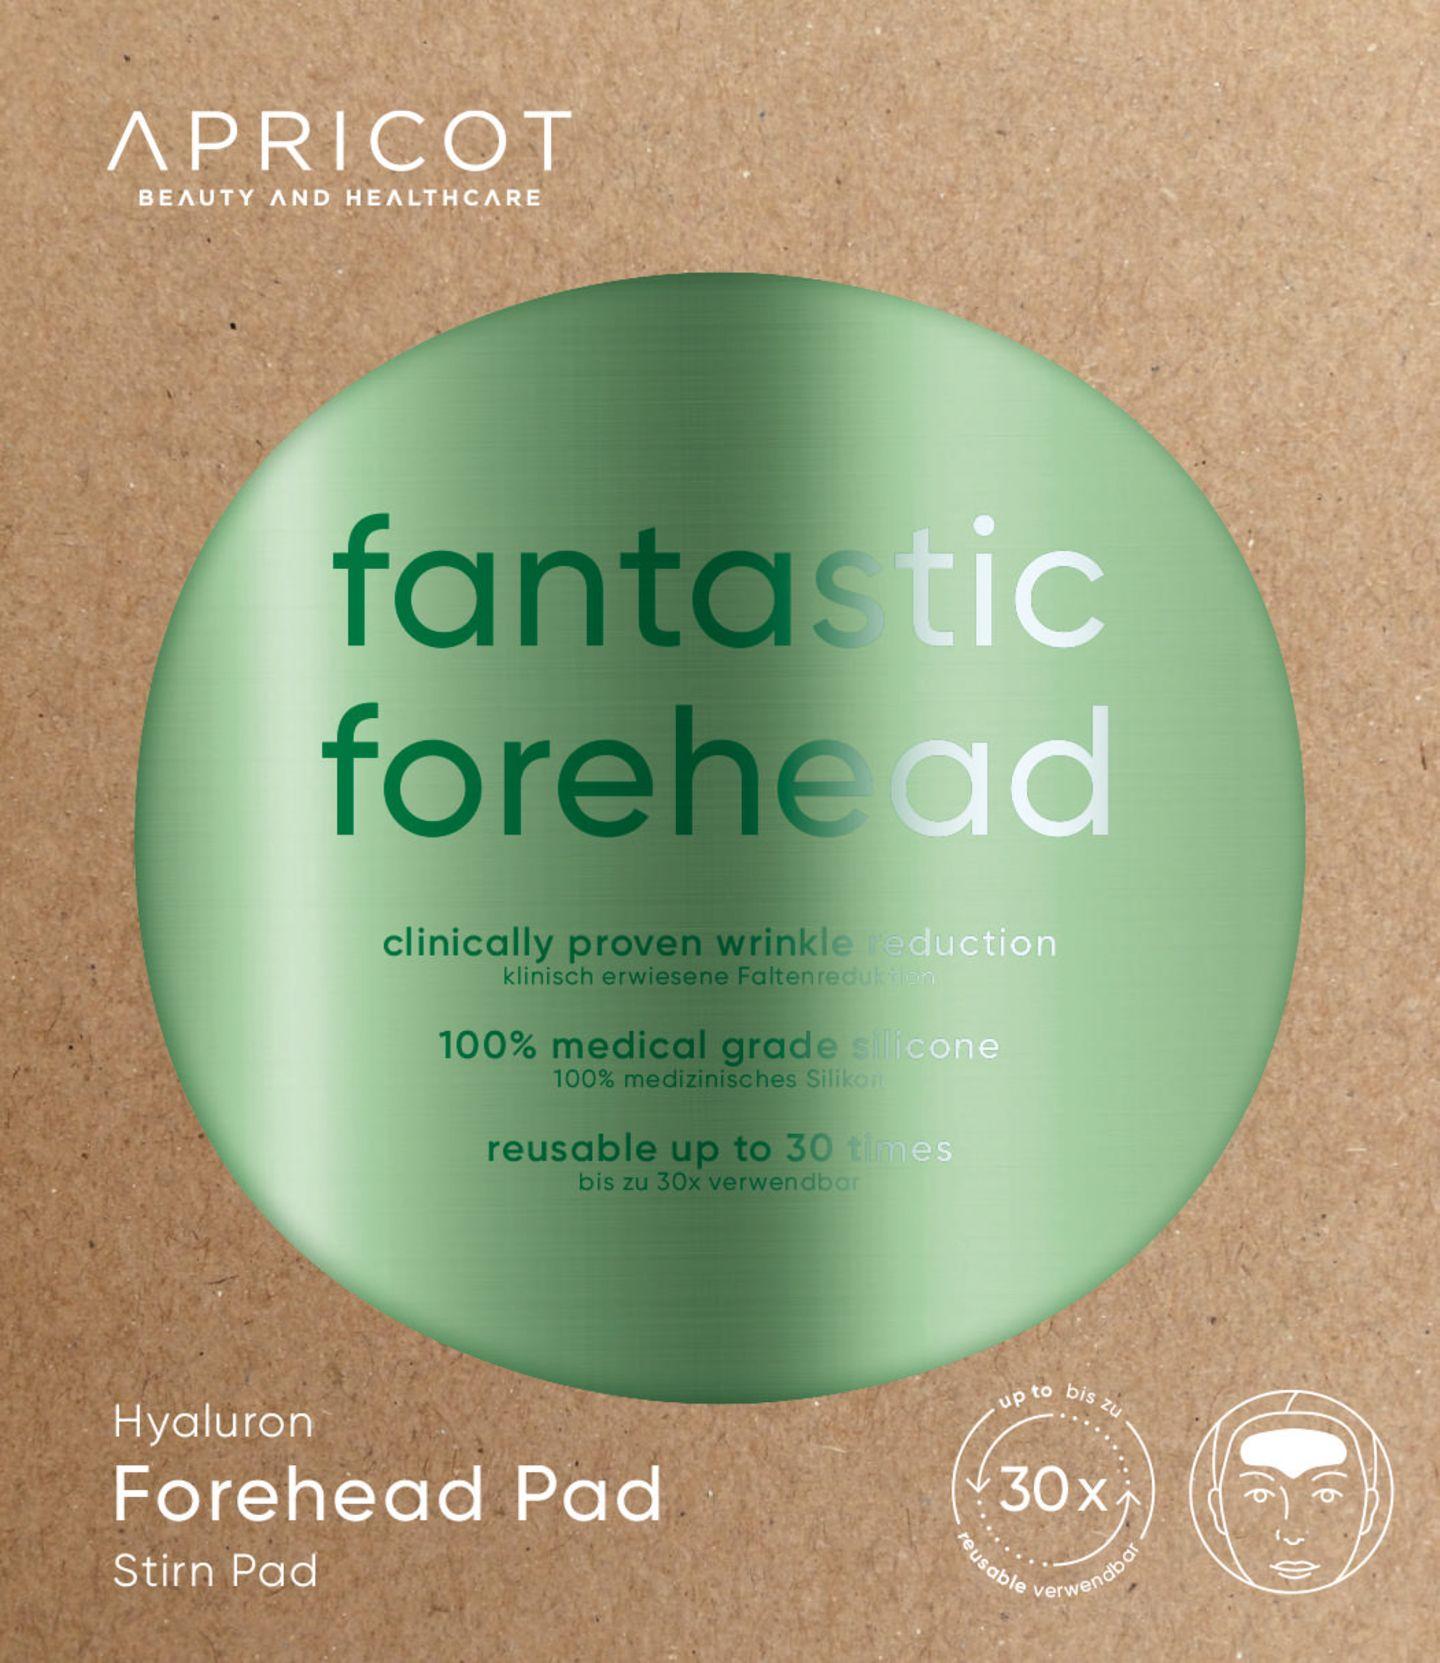 apricot fantastic forehead